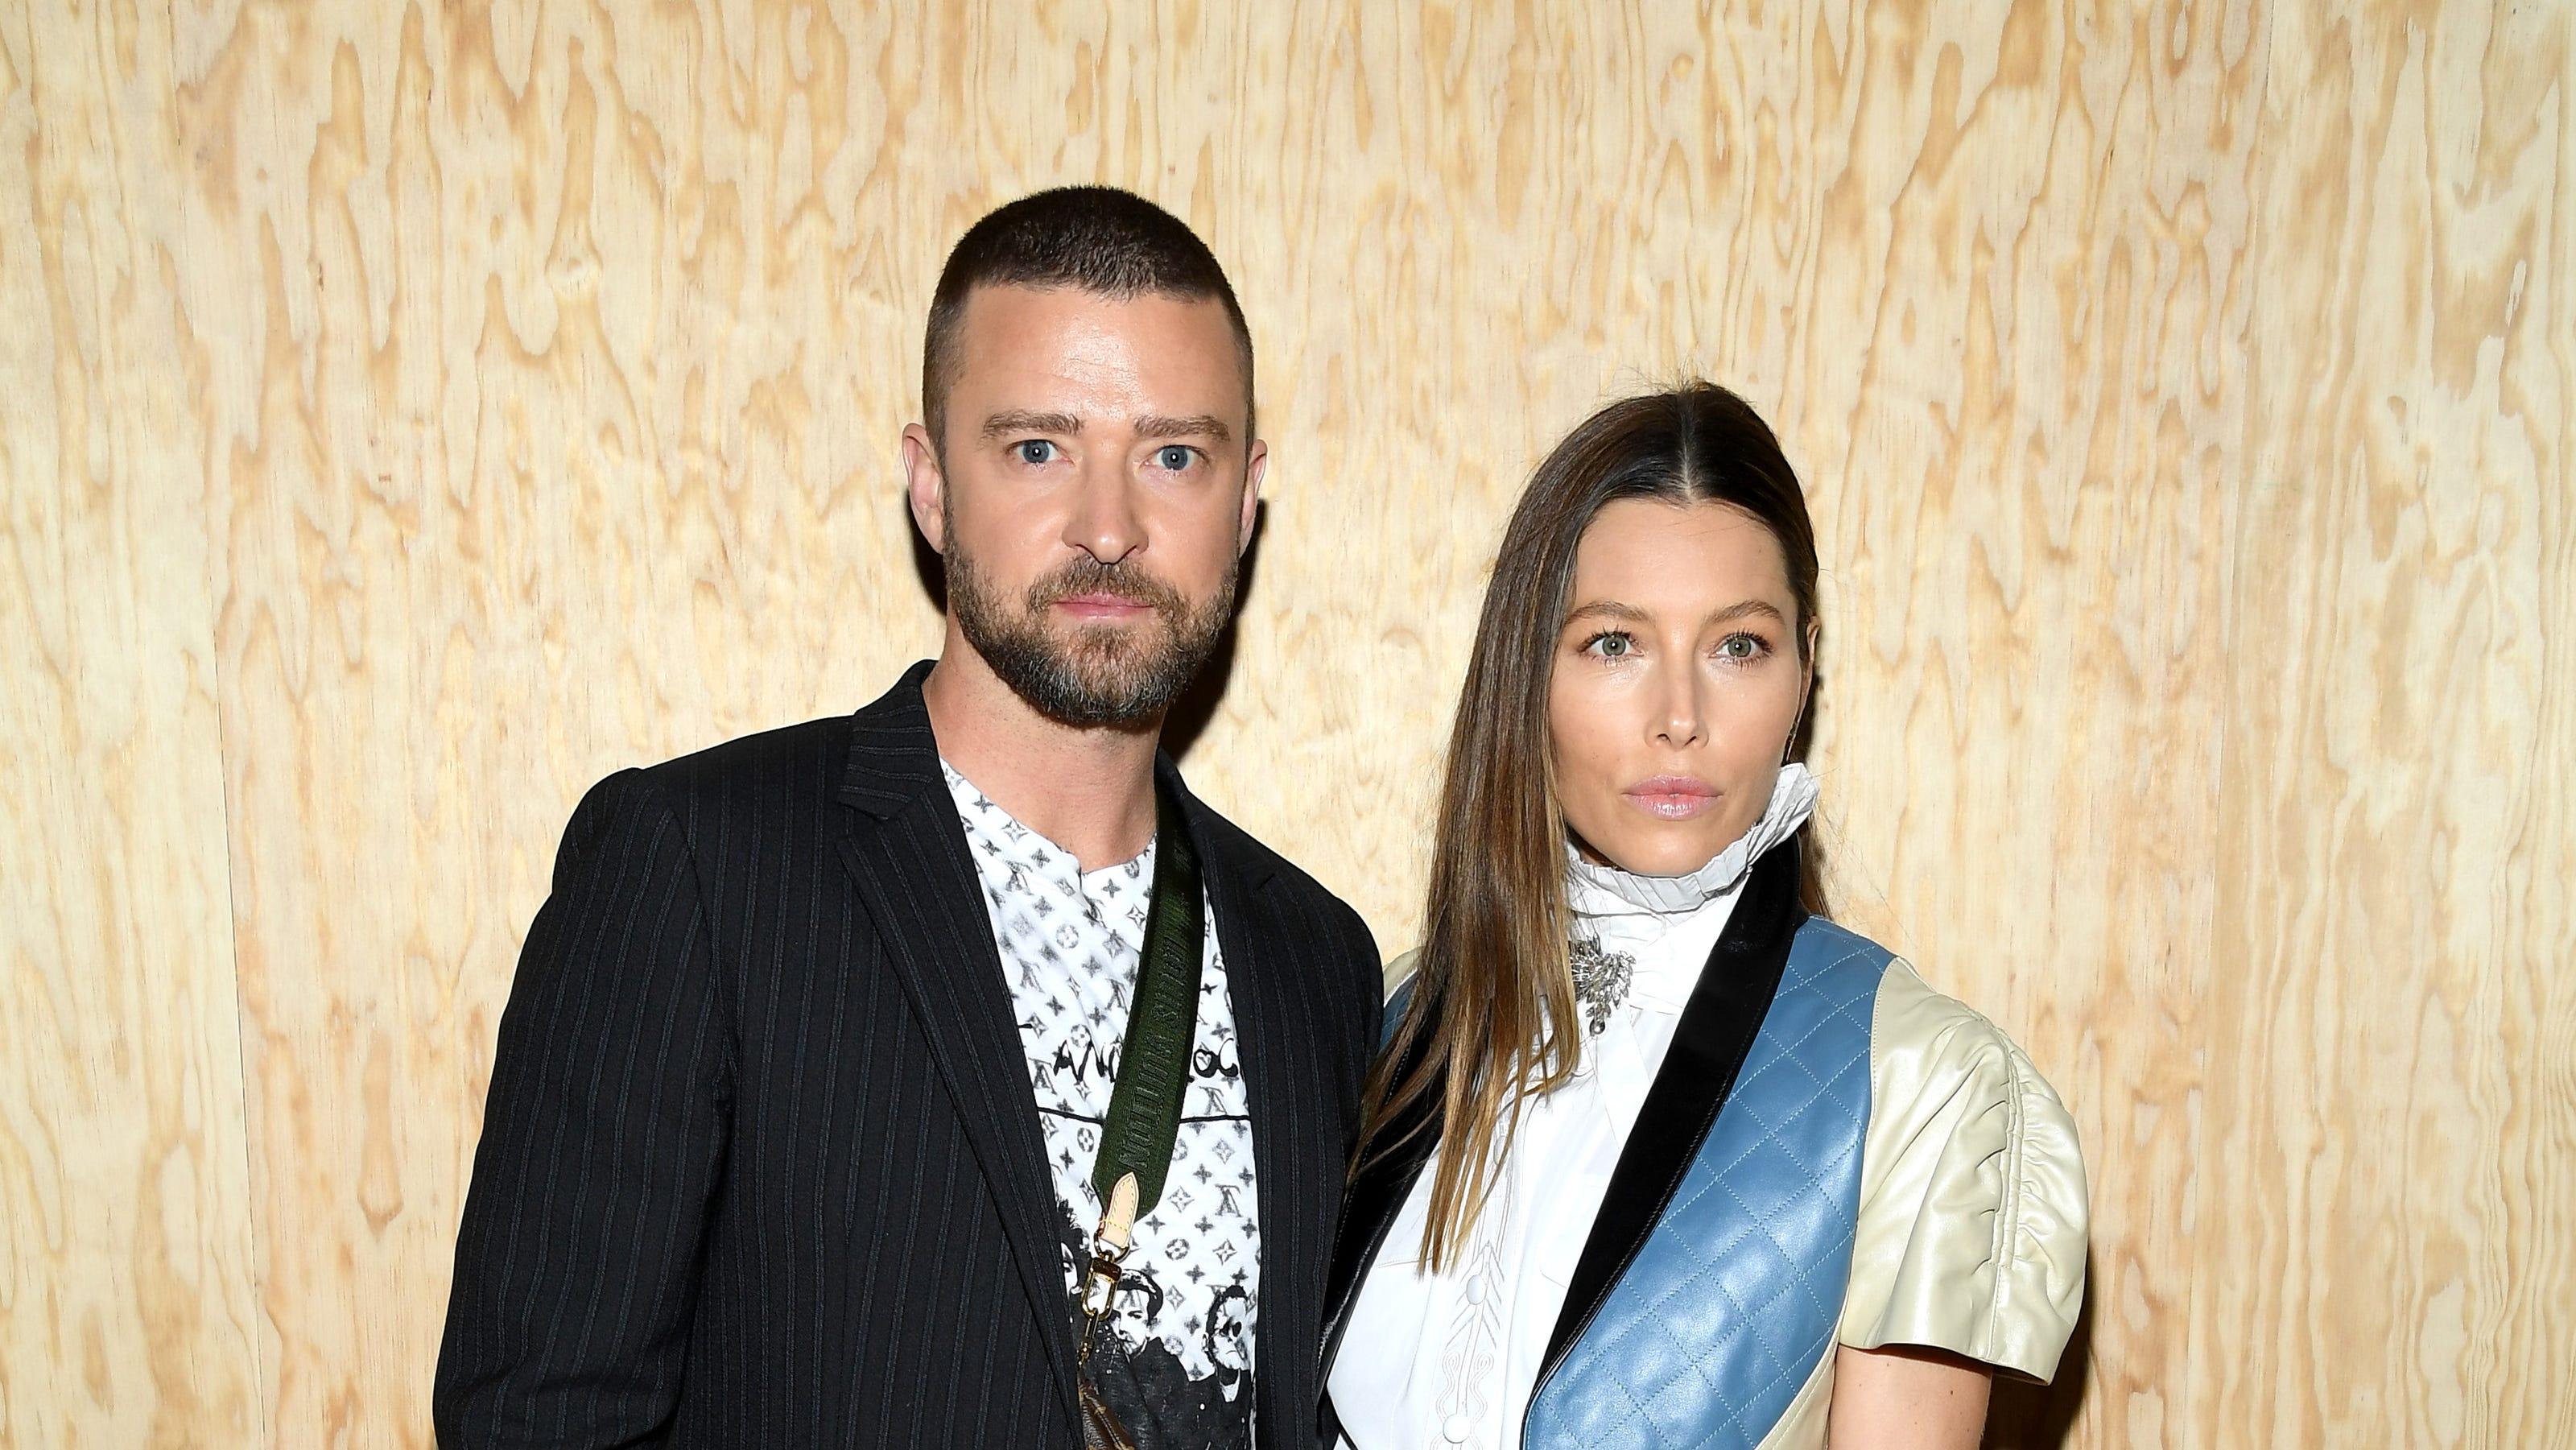 Justin Timberlake apologizes to Jessica Biel for 'behavior'; denies ...